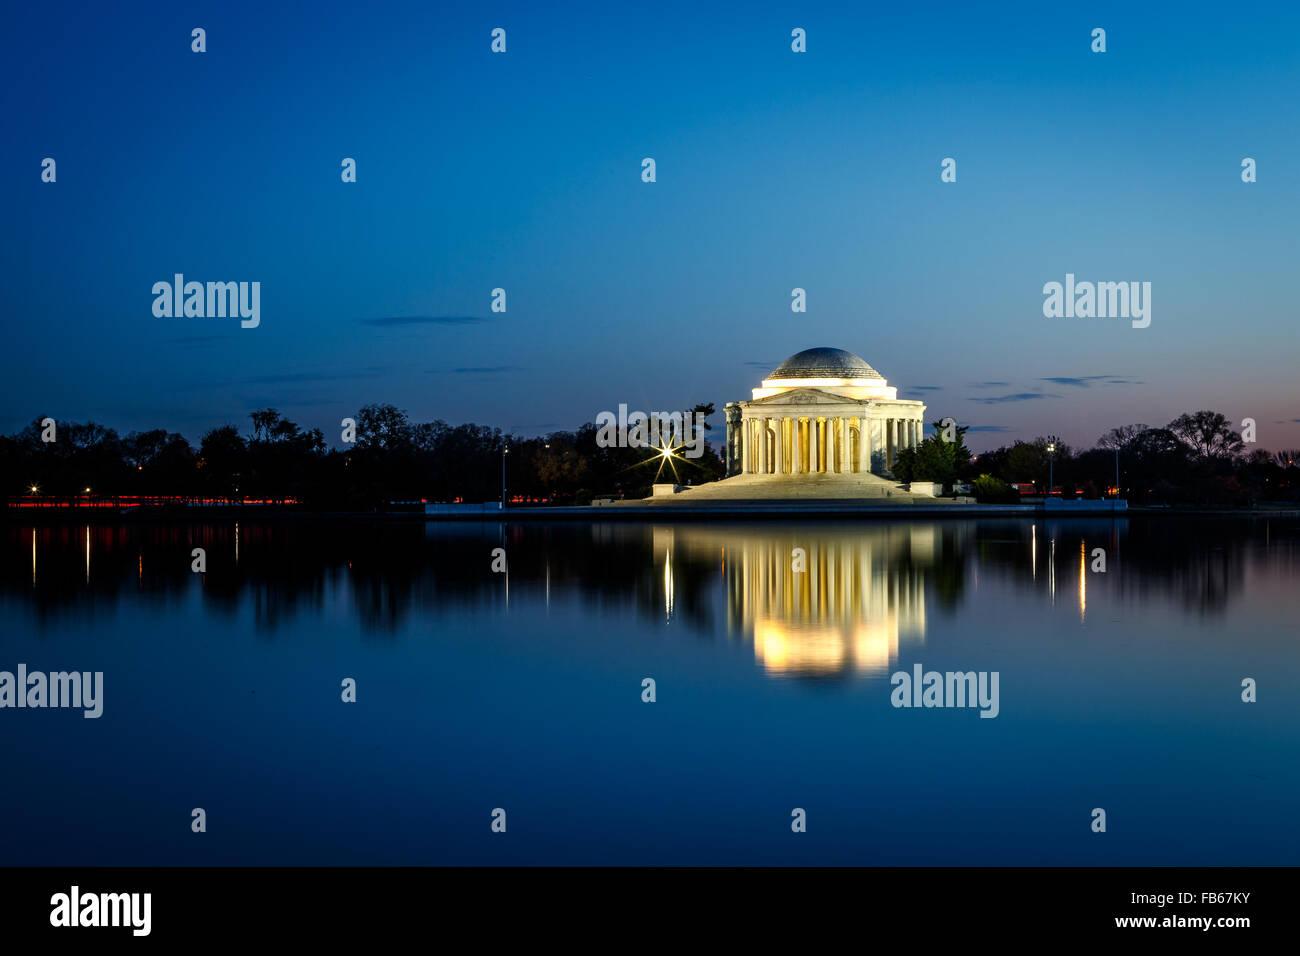 Jefferson Memorial iluminado en la noche en Washington D.C. Imagen De Stock